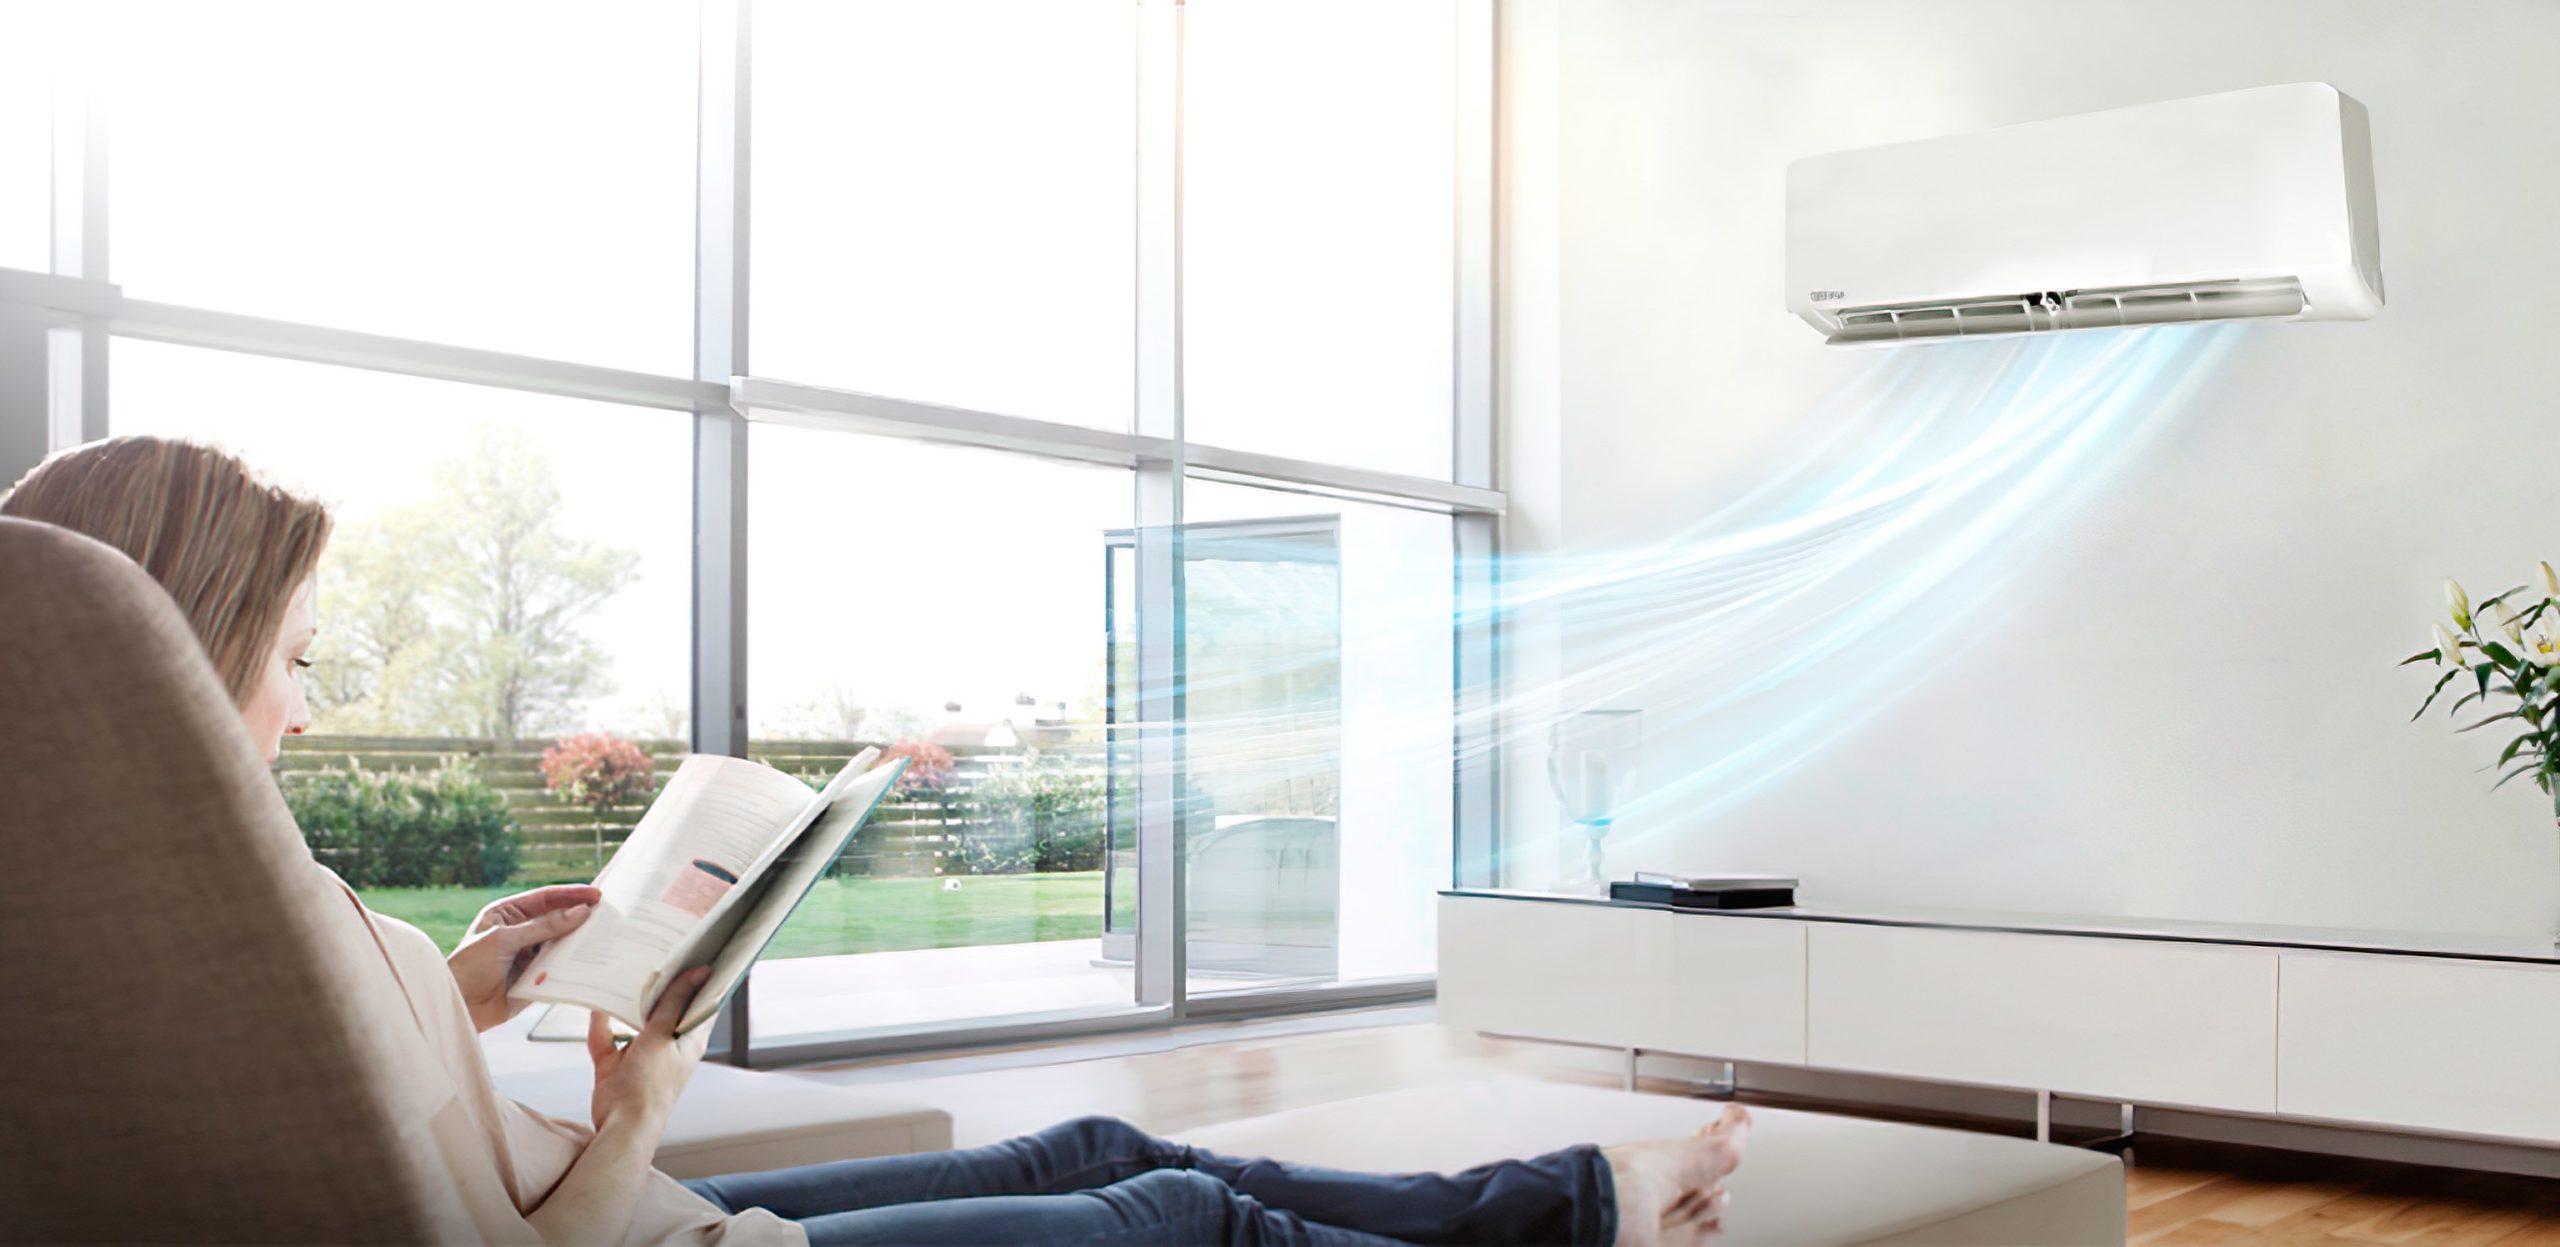 sentinel alarm airco installeren services cool verfrissen zomer wifi heemstede